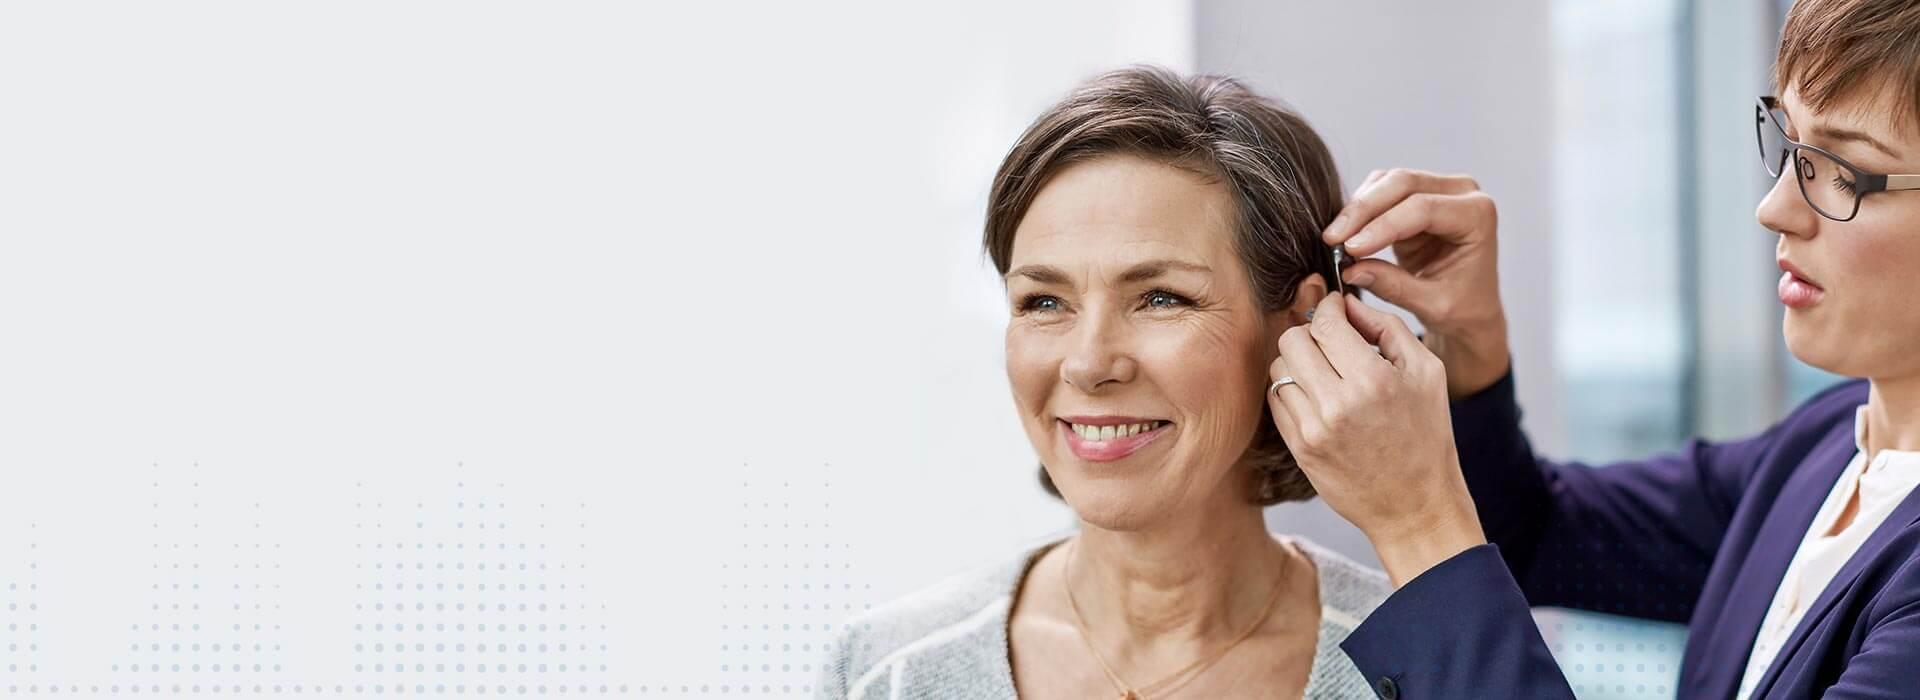 Get_personal_hearing_aid_fittings_1920x700_v1_dva